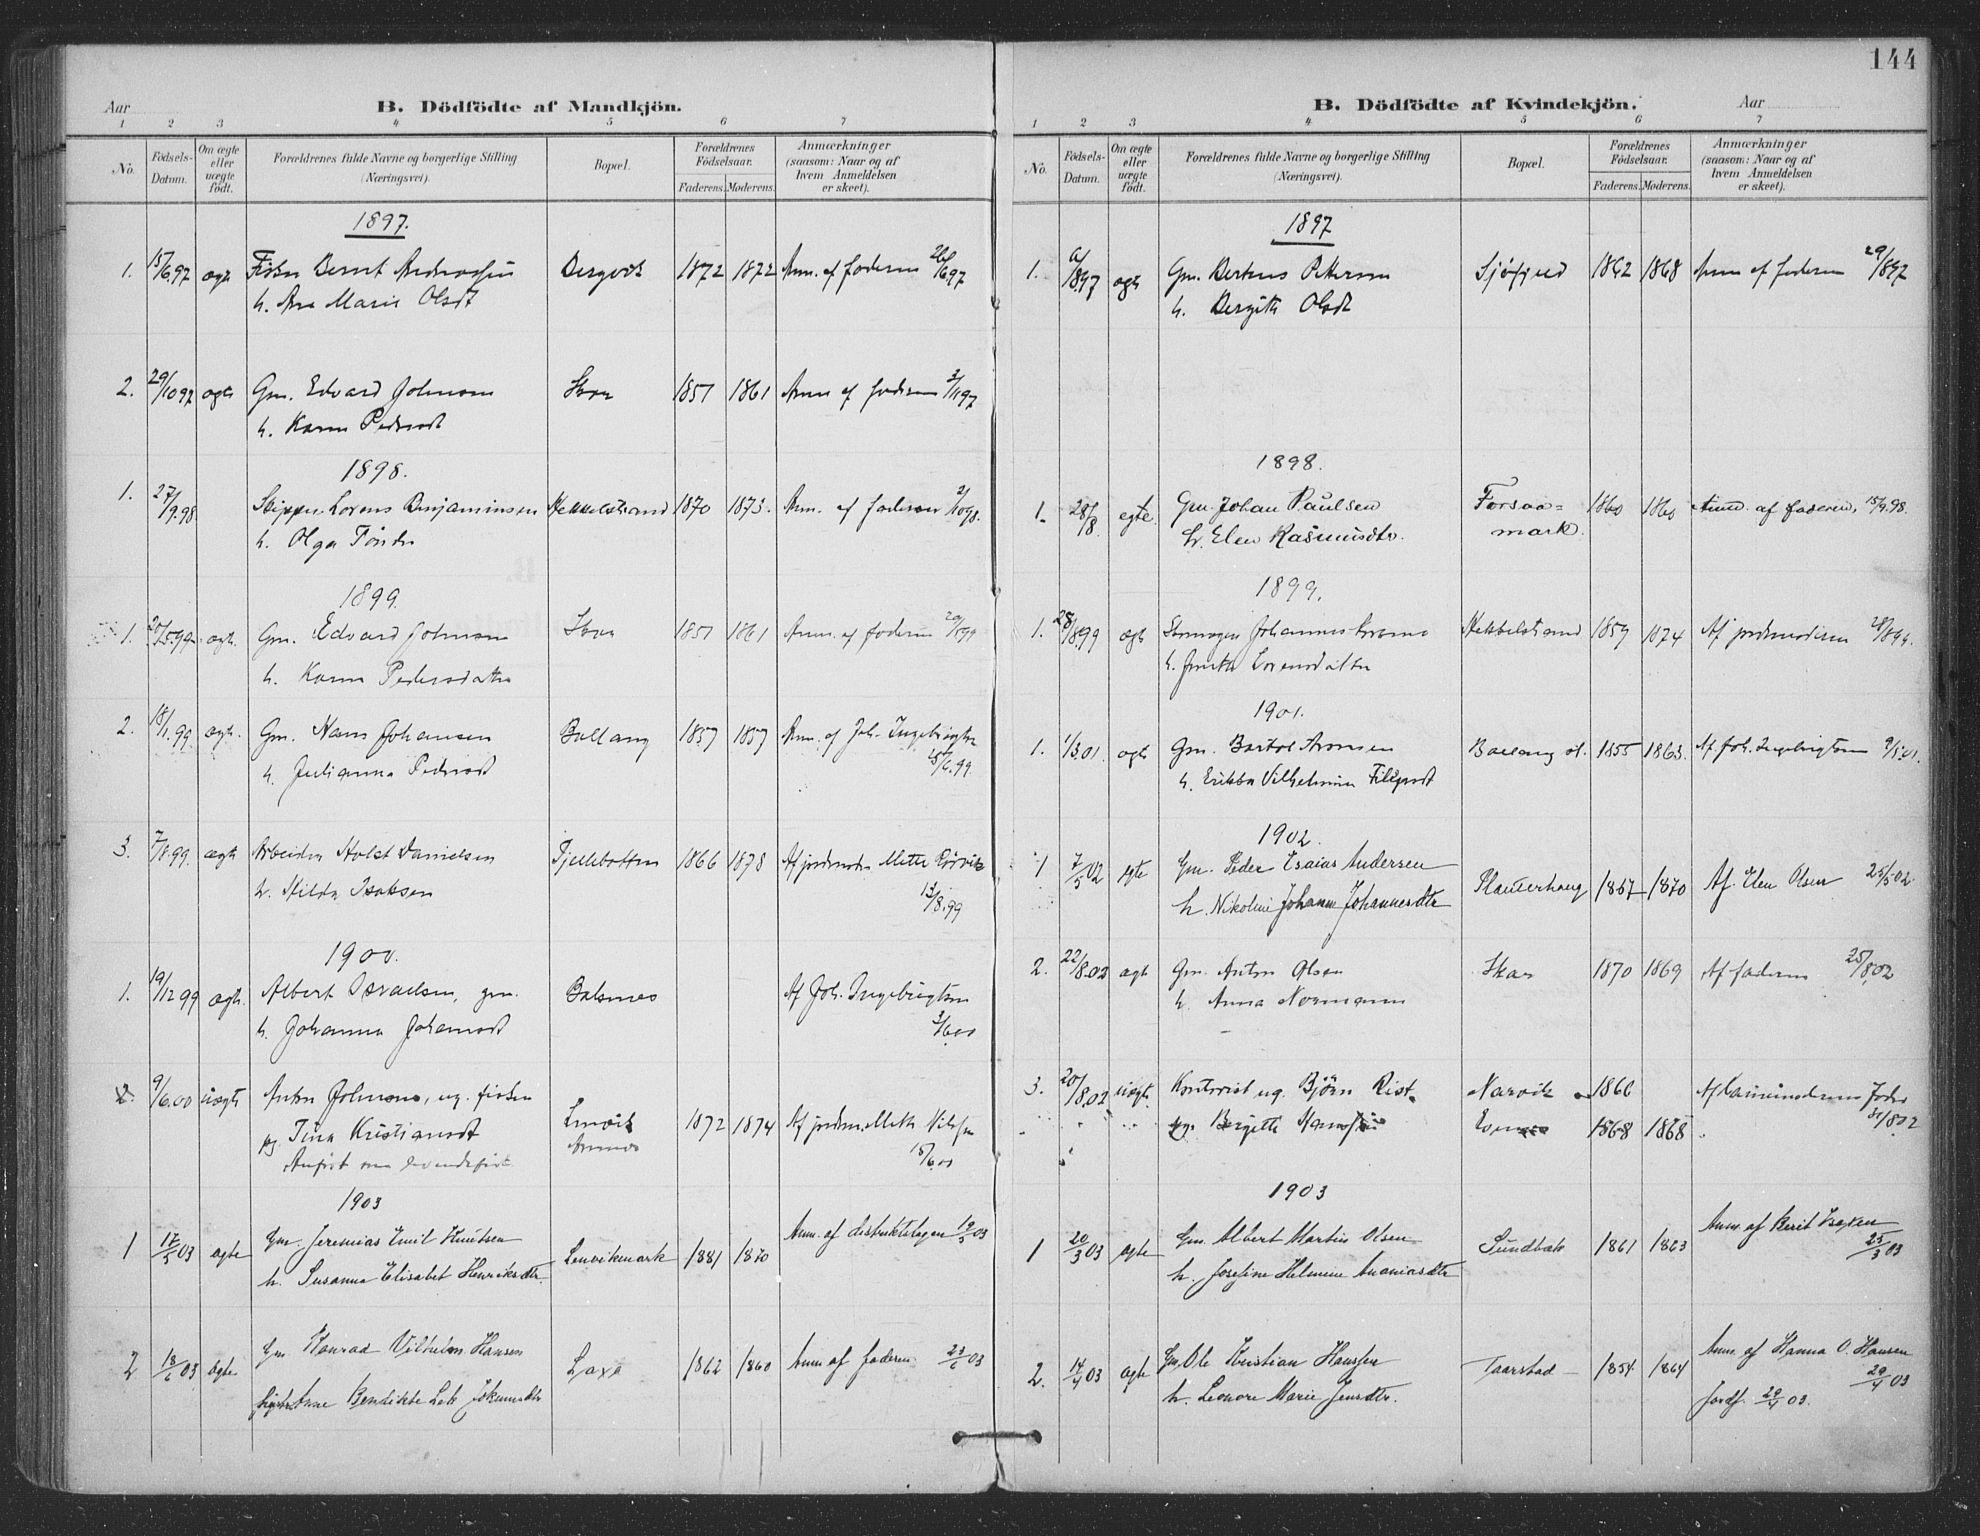 SAT, Ministerialprotokoller, klokkerbøker og fødselsregistre - Nordland, 863/L0899: Ministerialbok nr. 863A11, 1897-1906, s. 144